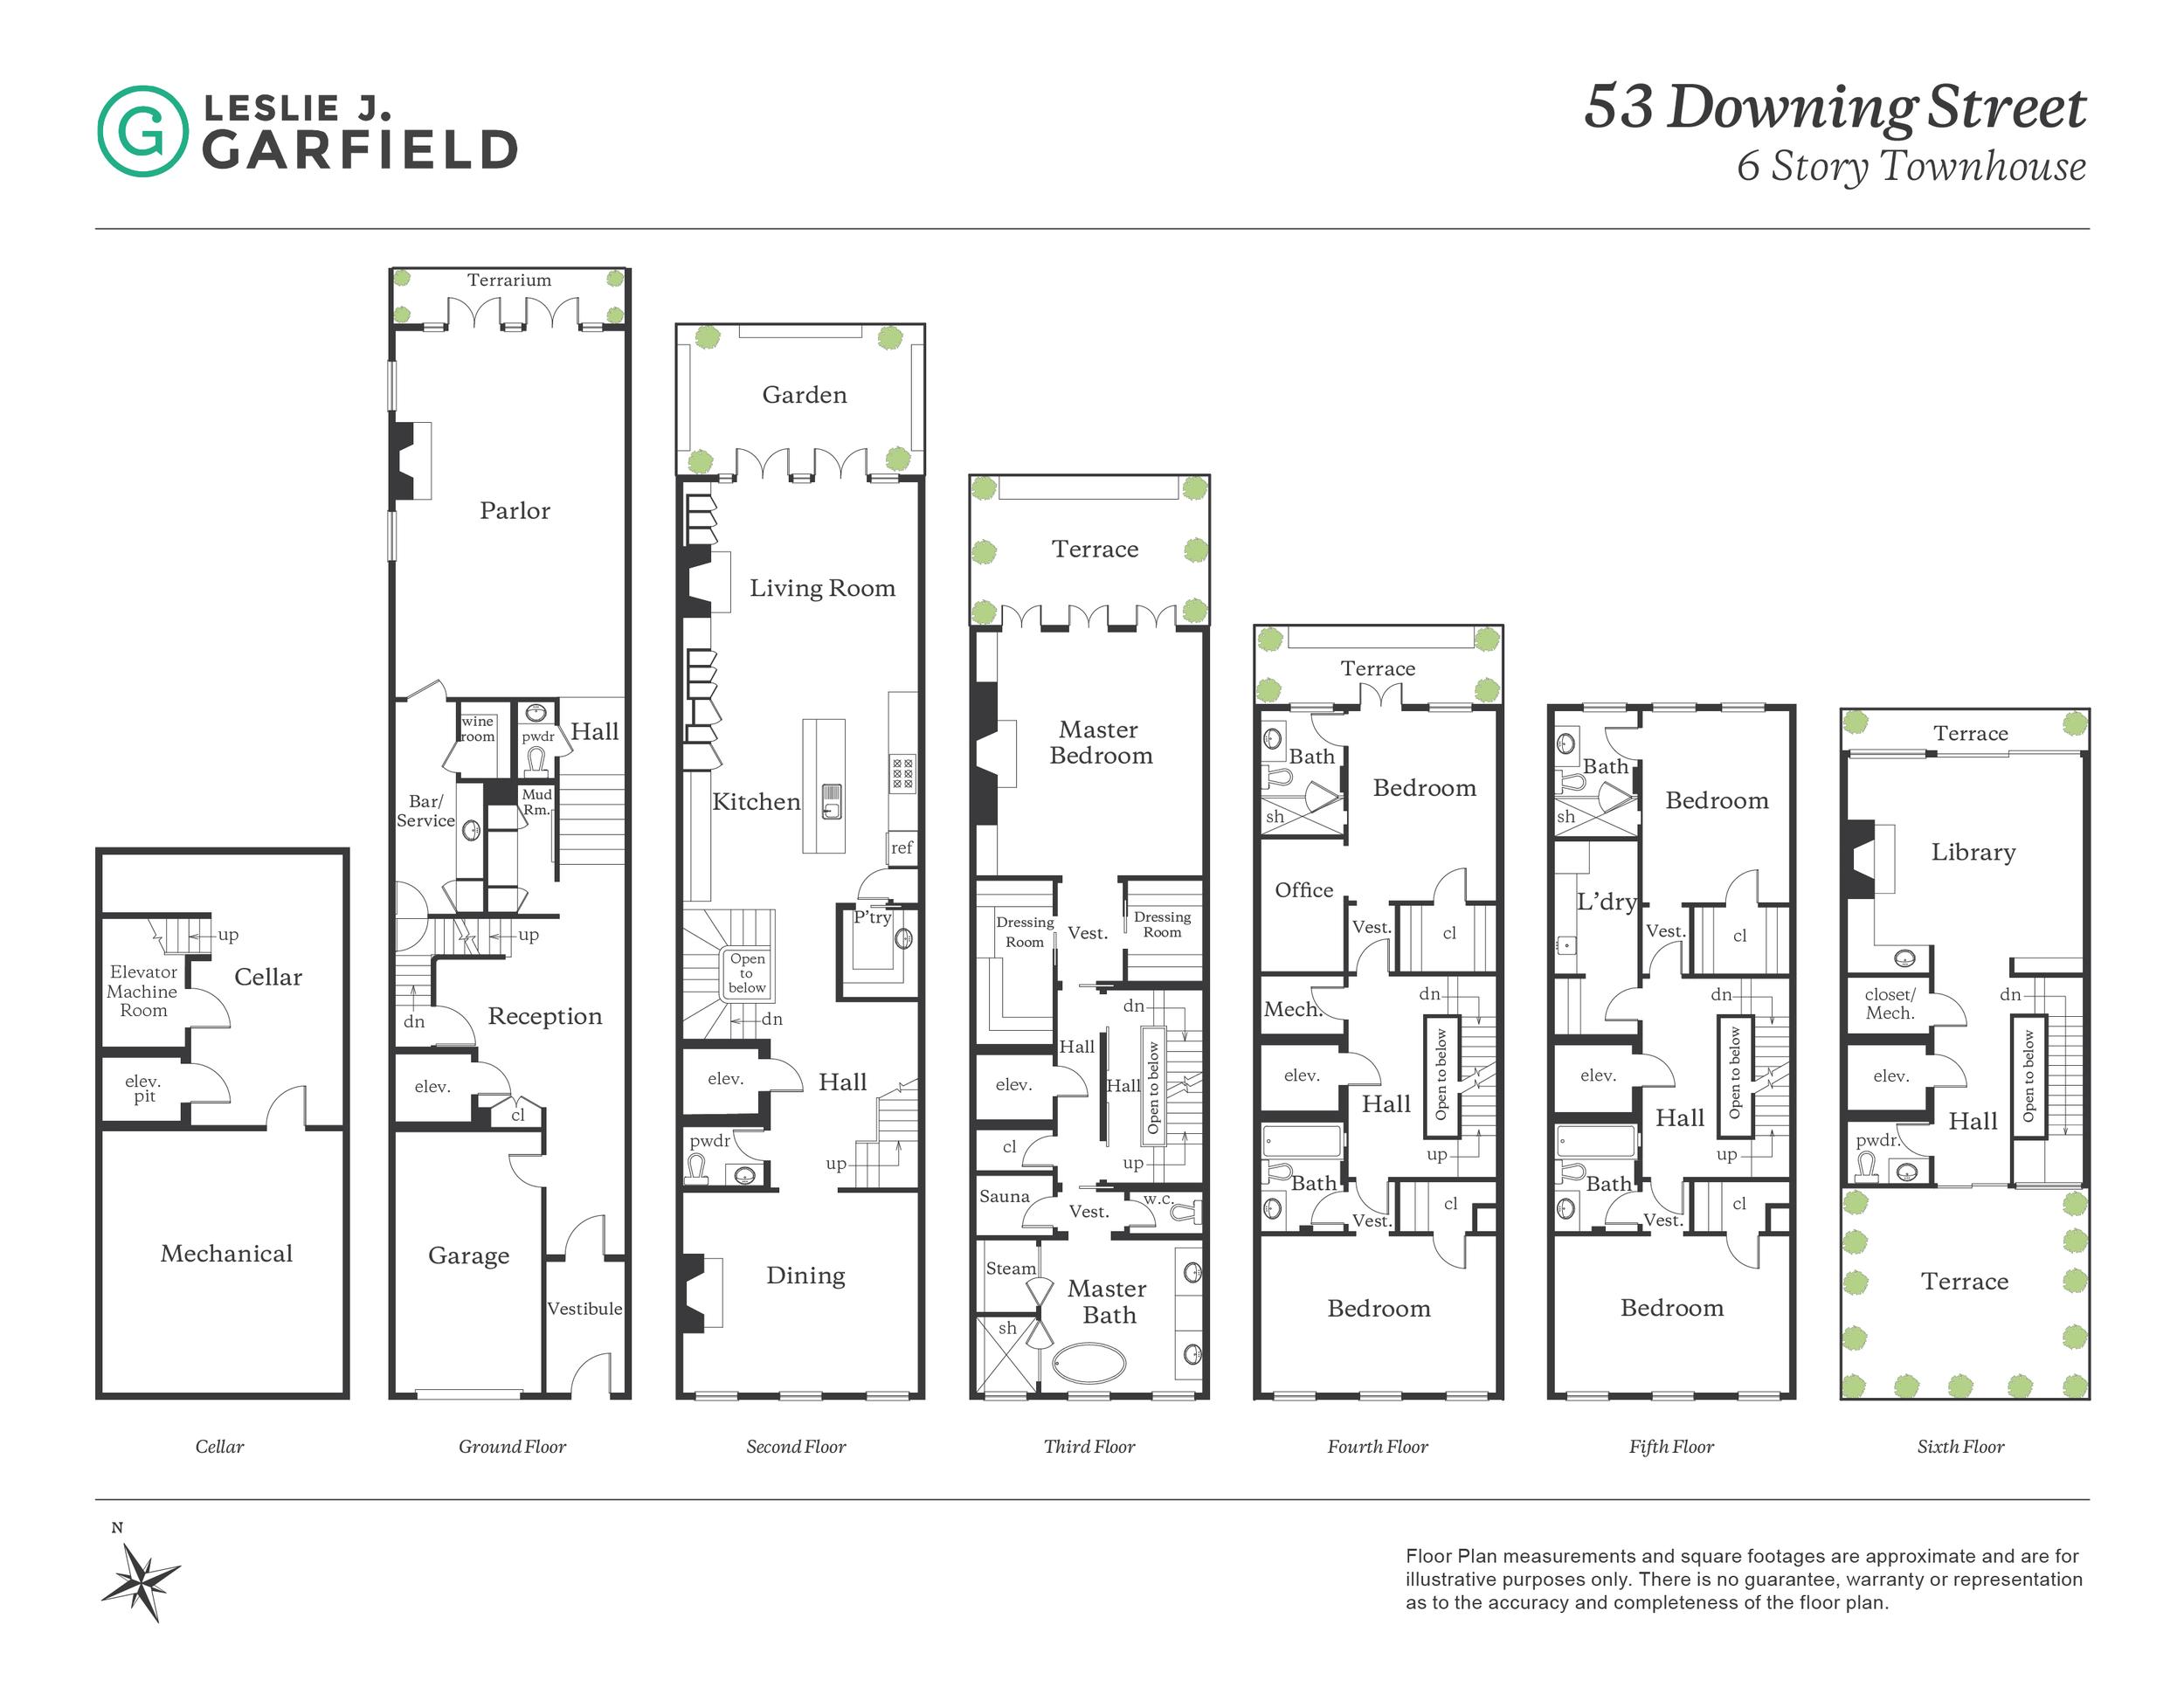 The Floorplan 53 Downing Street